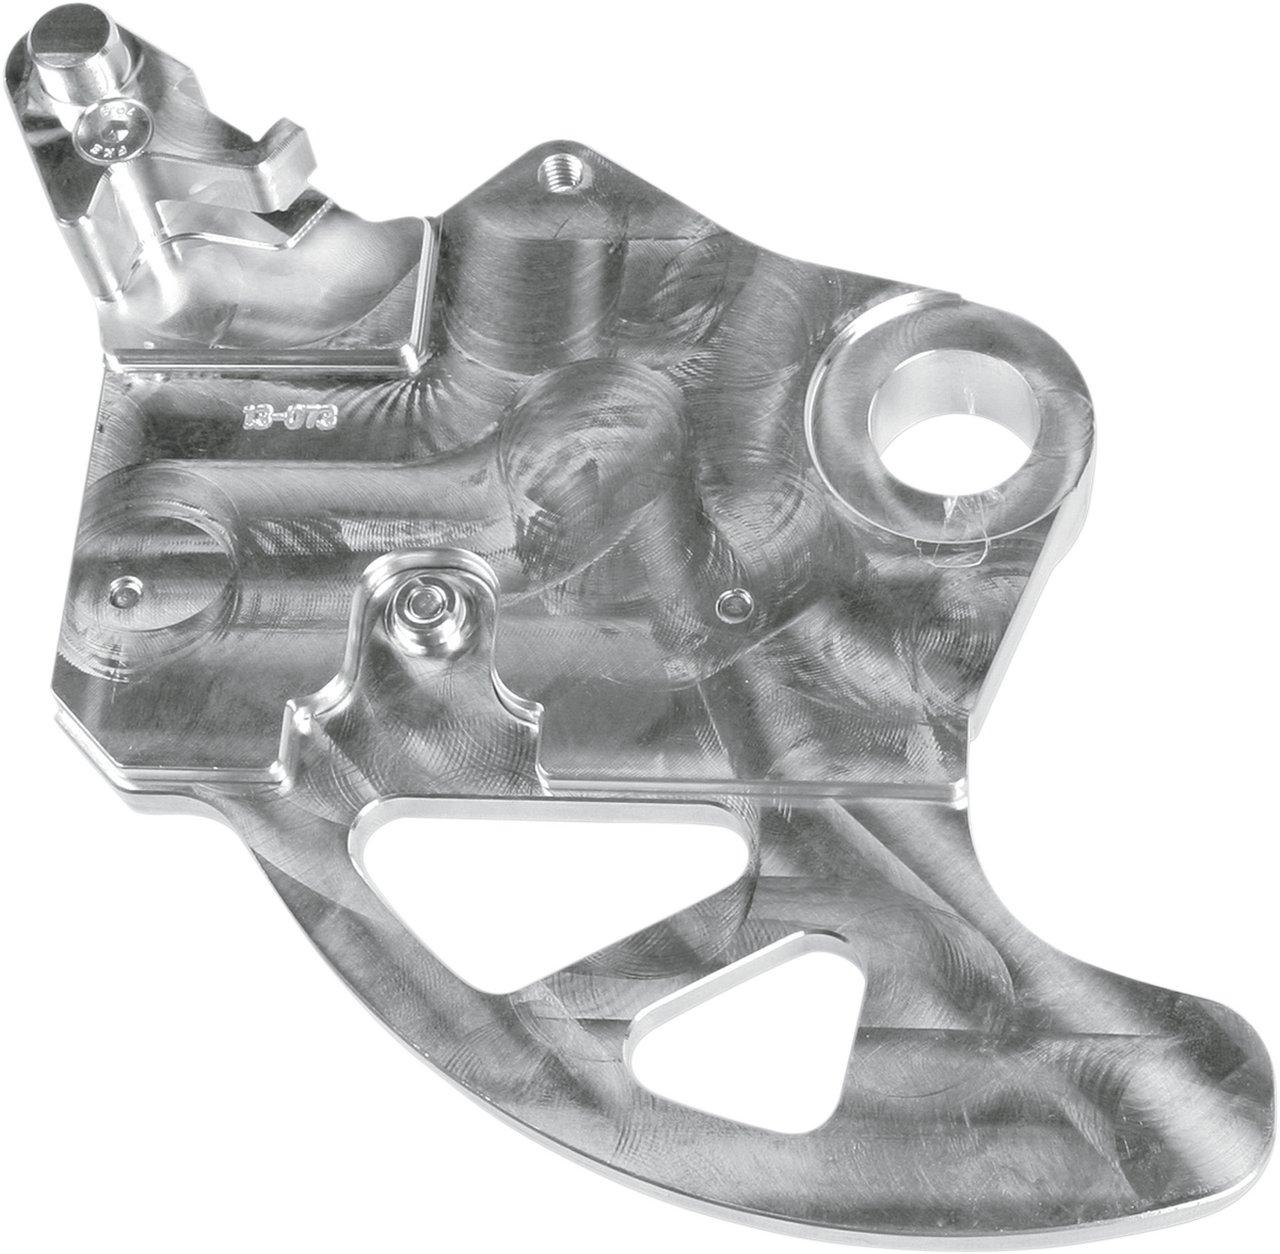 【MOOSE RACING】PRO 剎車碟盤護蓋組 [1711-0486] - 「Webike-摩托百貨」